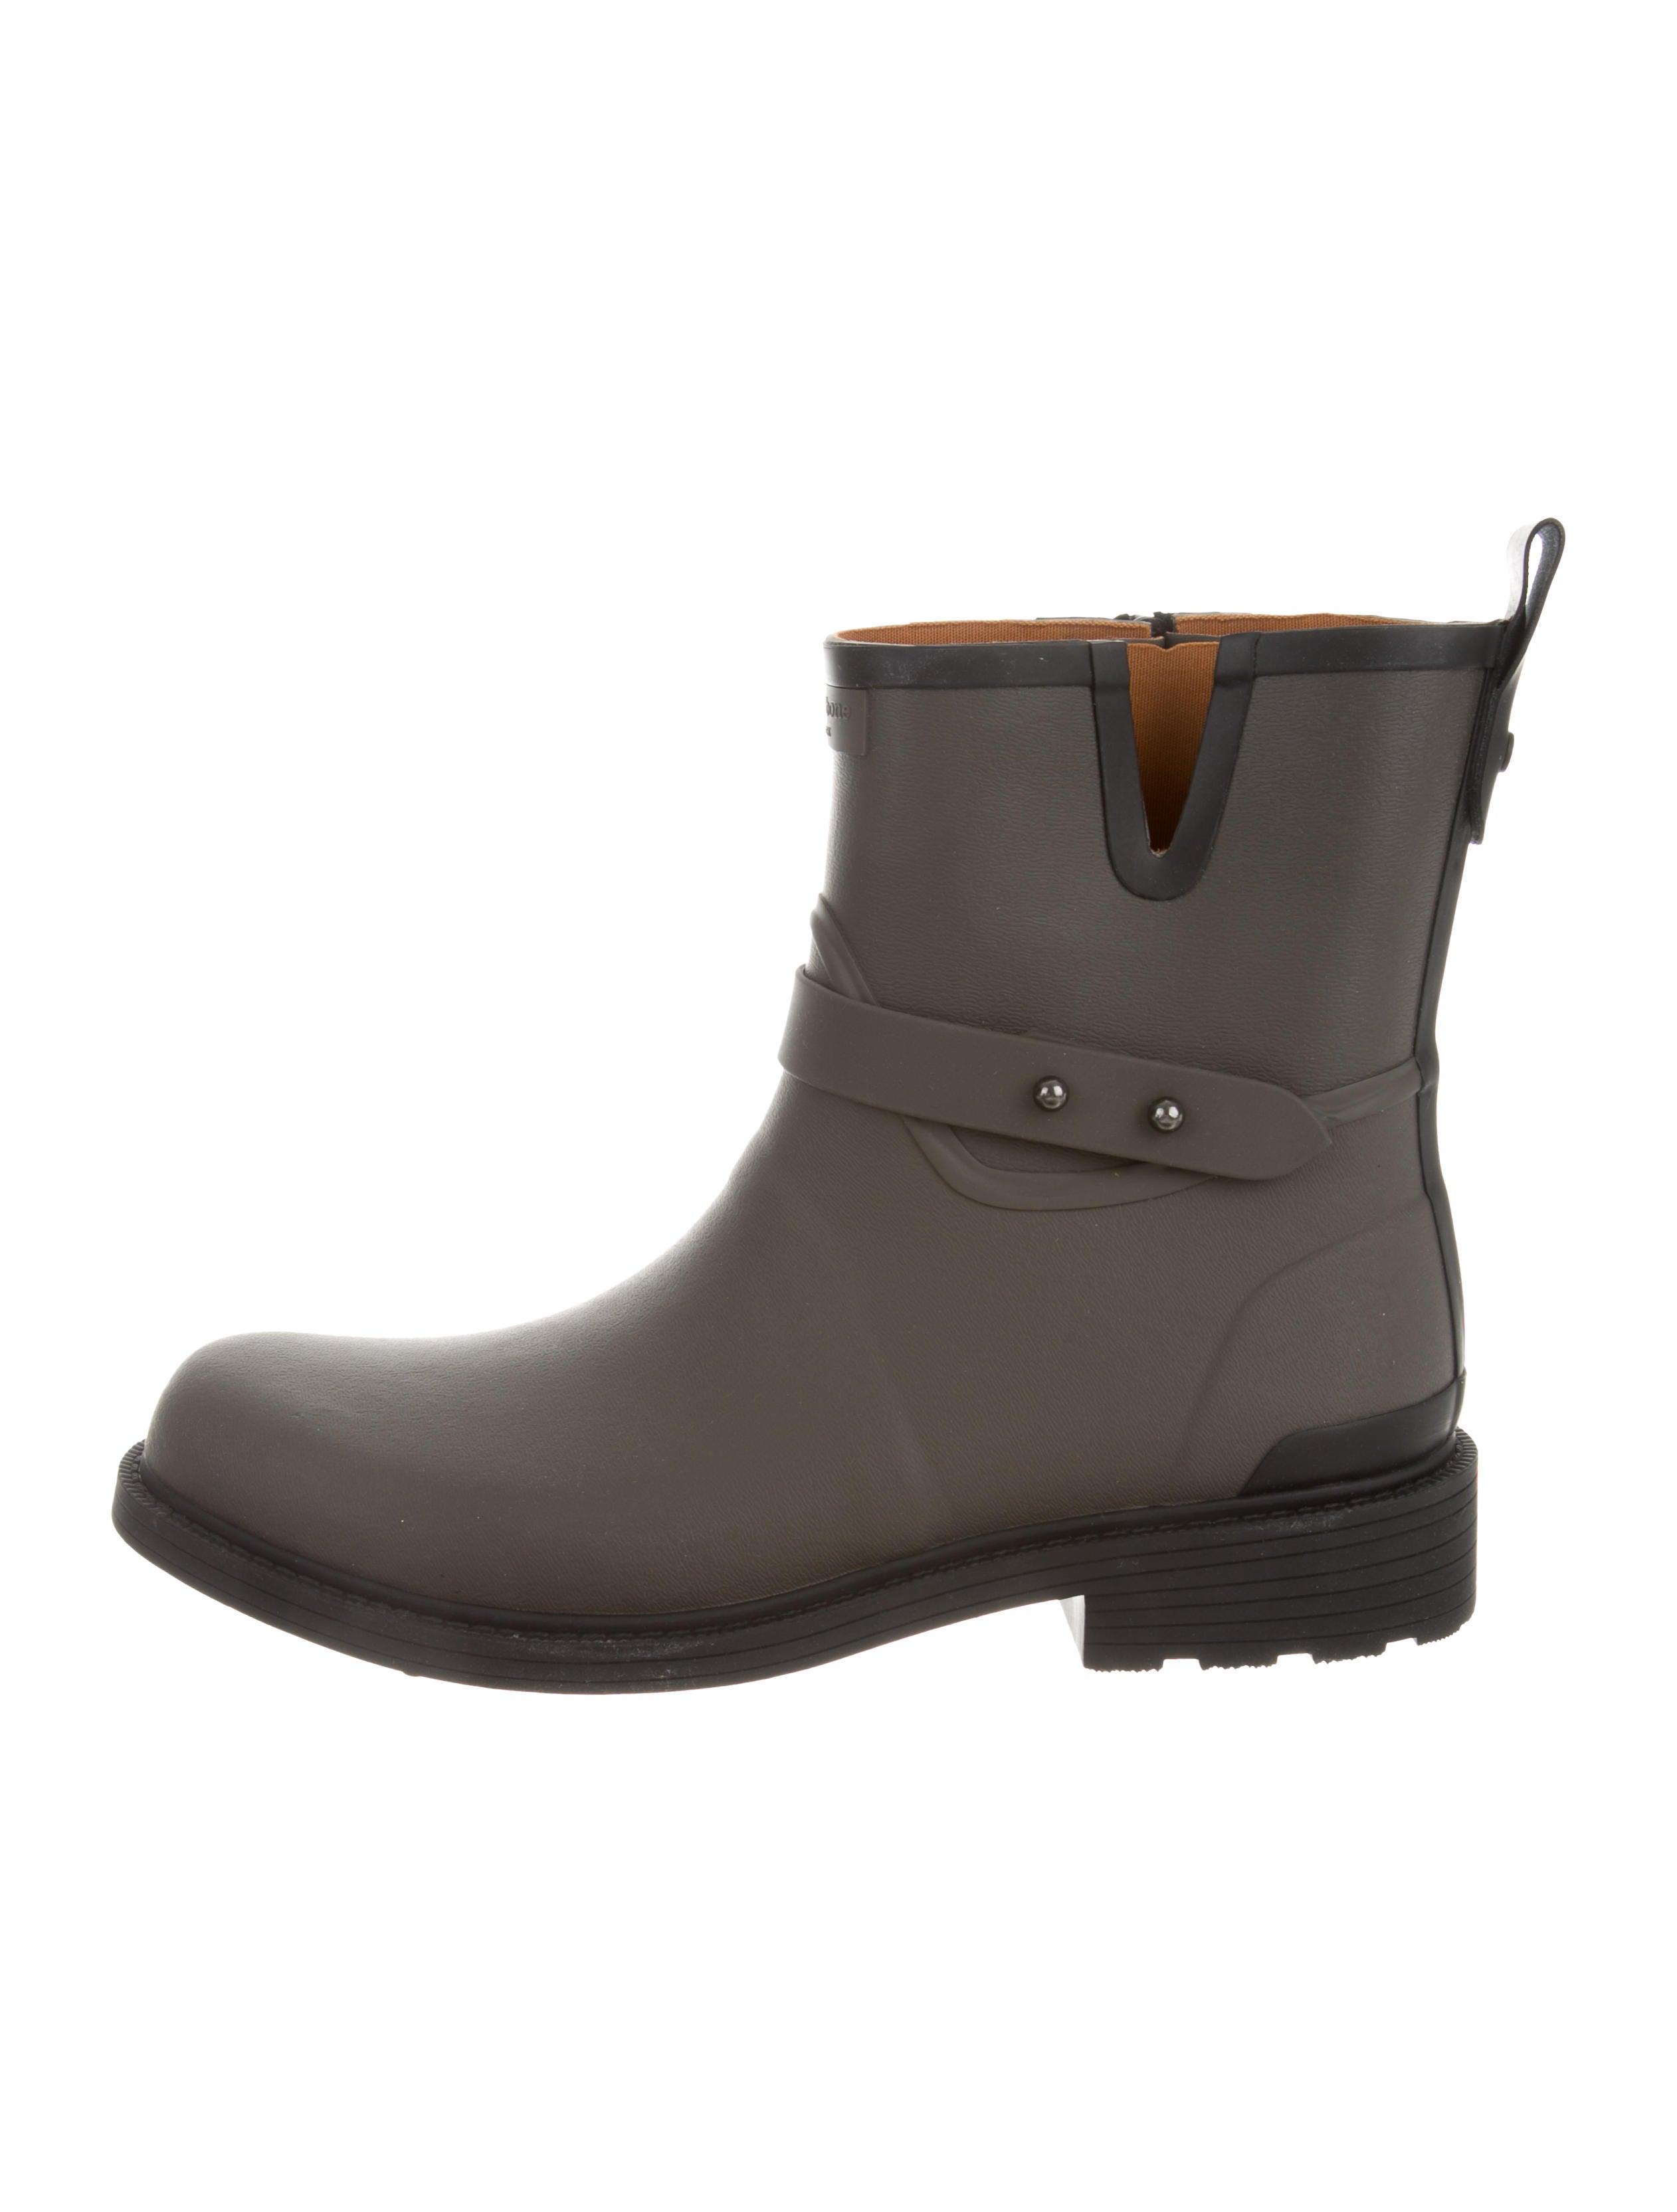 Rag & Bone Logo-Accented Rain Boots discount 100% guaranteed rCKkol